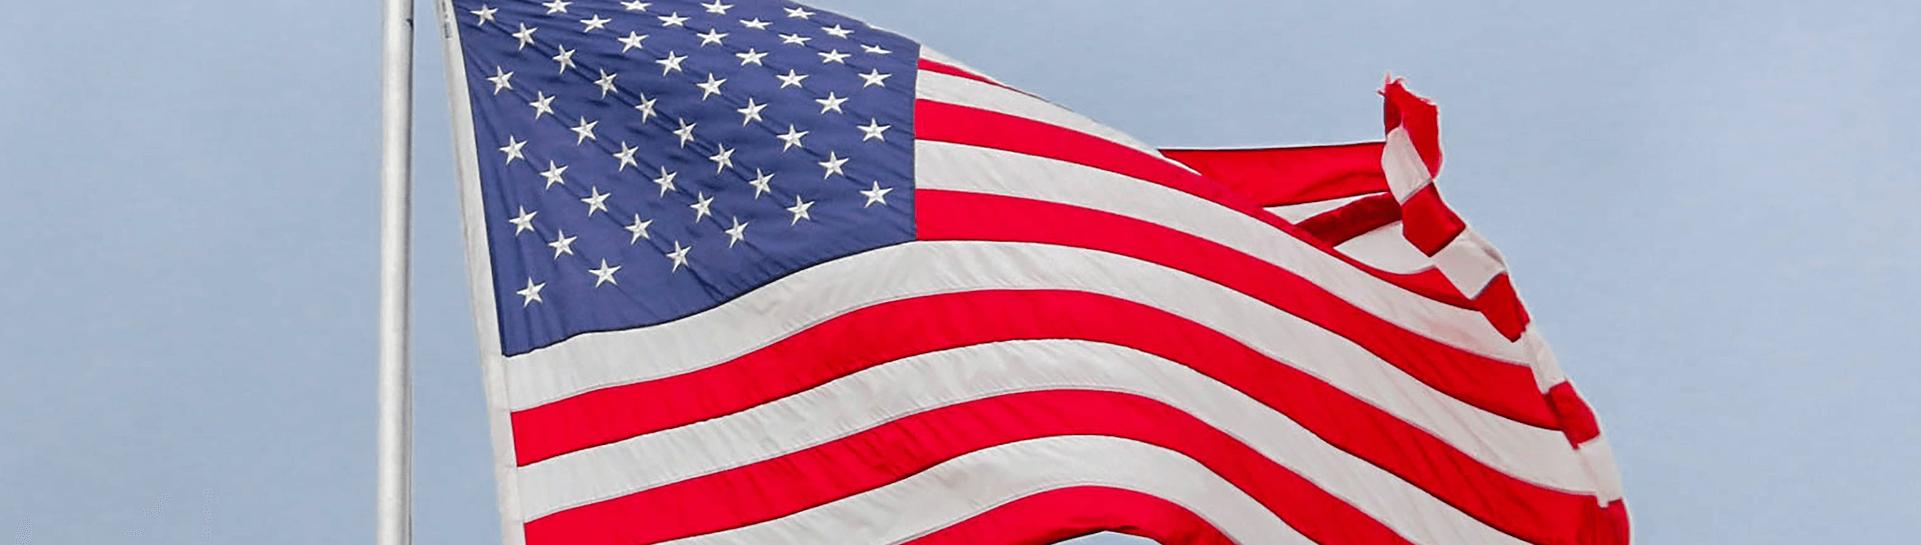 American flag - Tulane School of Professional Advancement